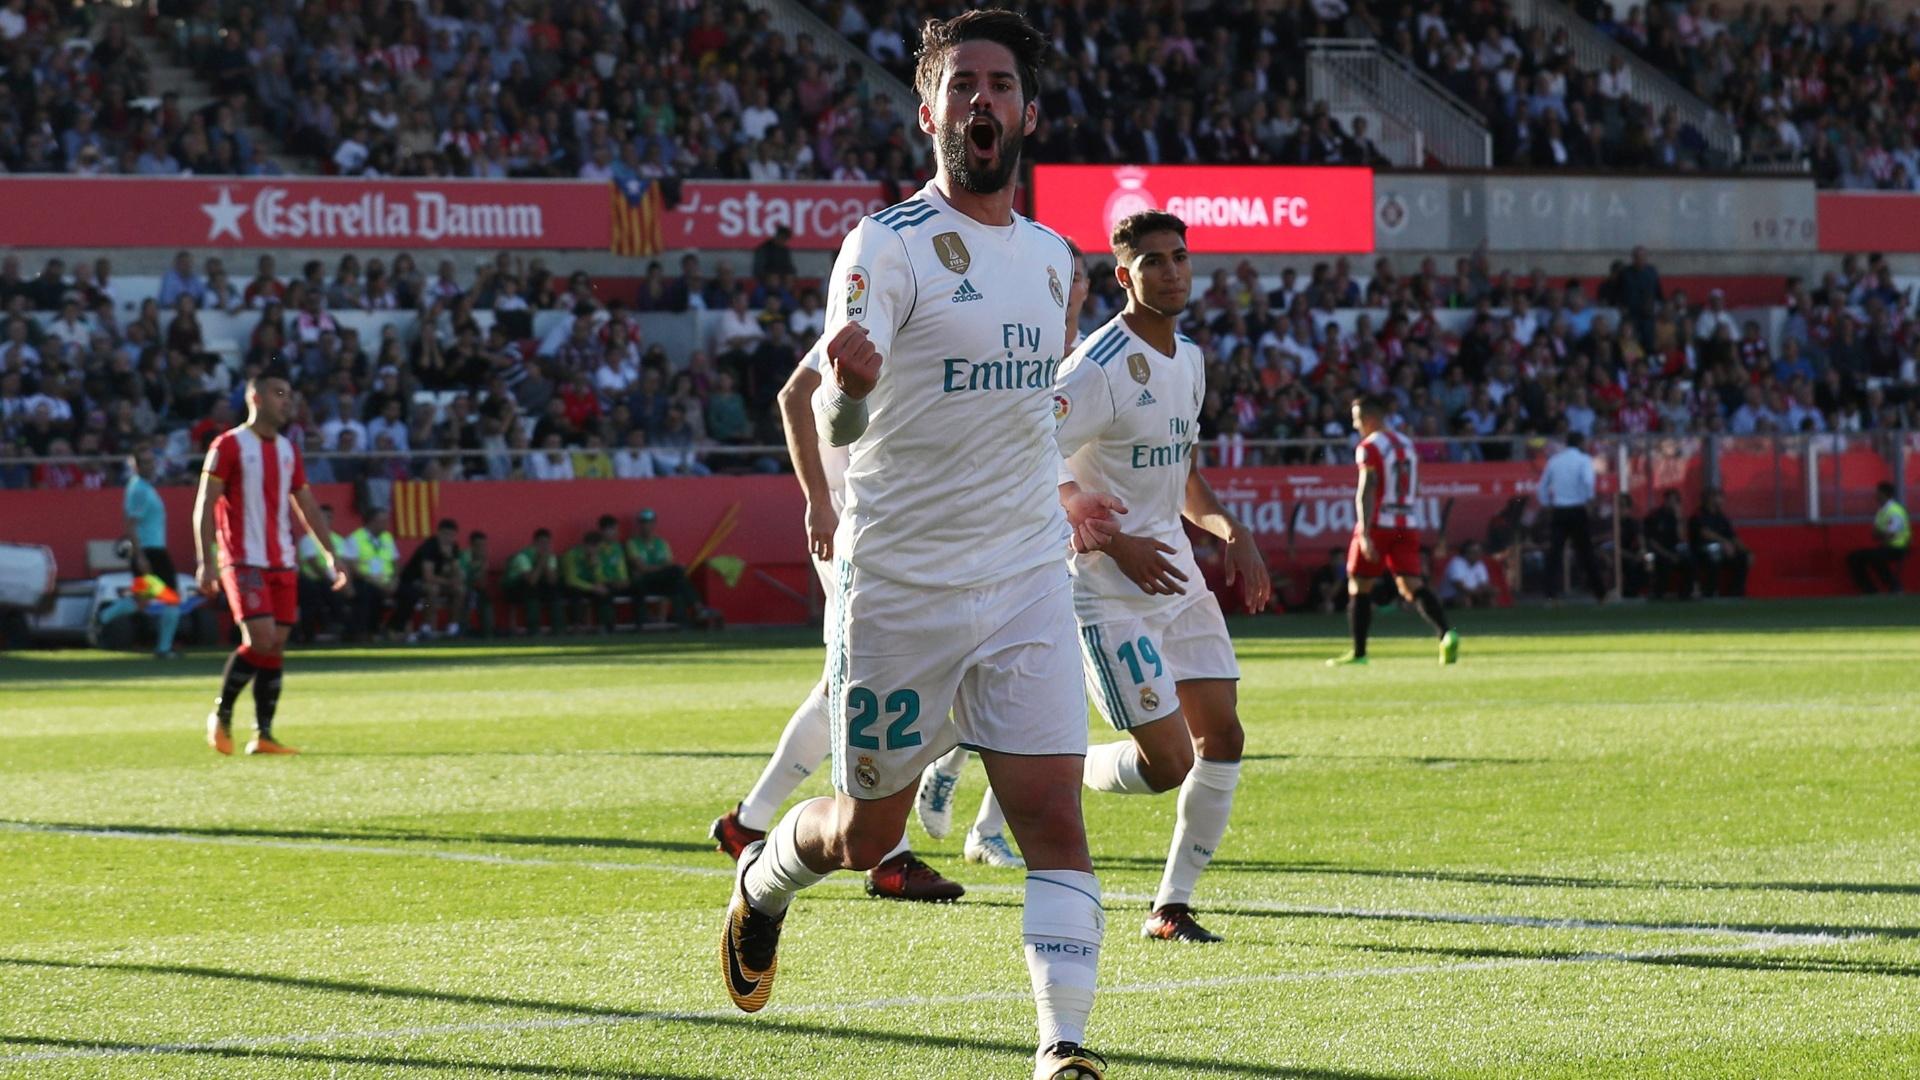 Isco comemora gol para o Real Madrid contra o Girona